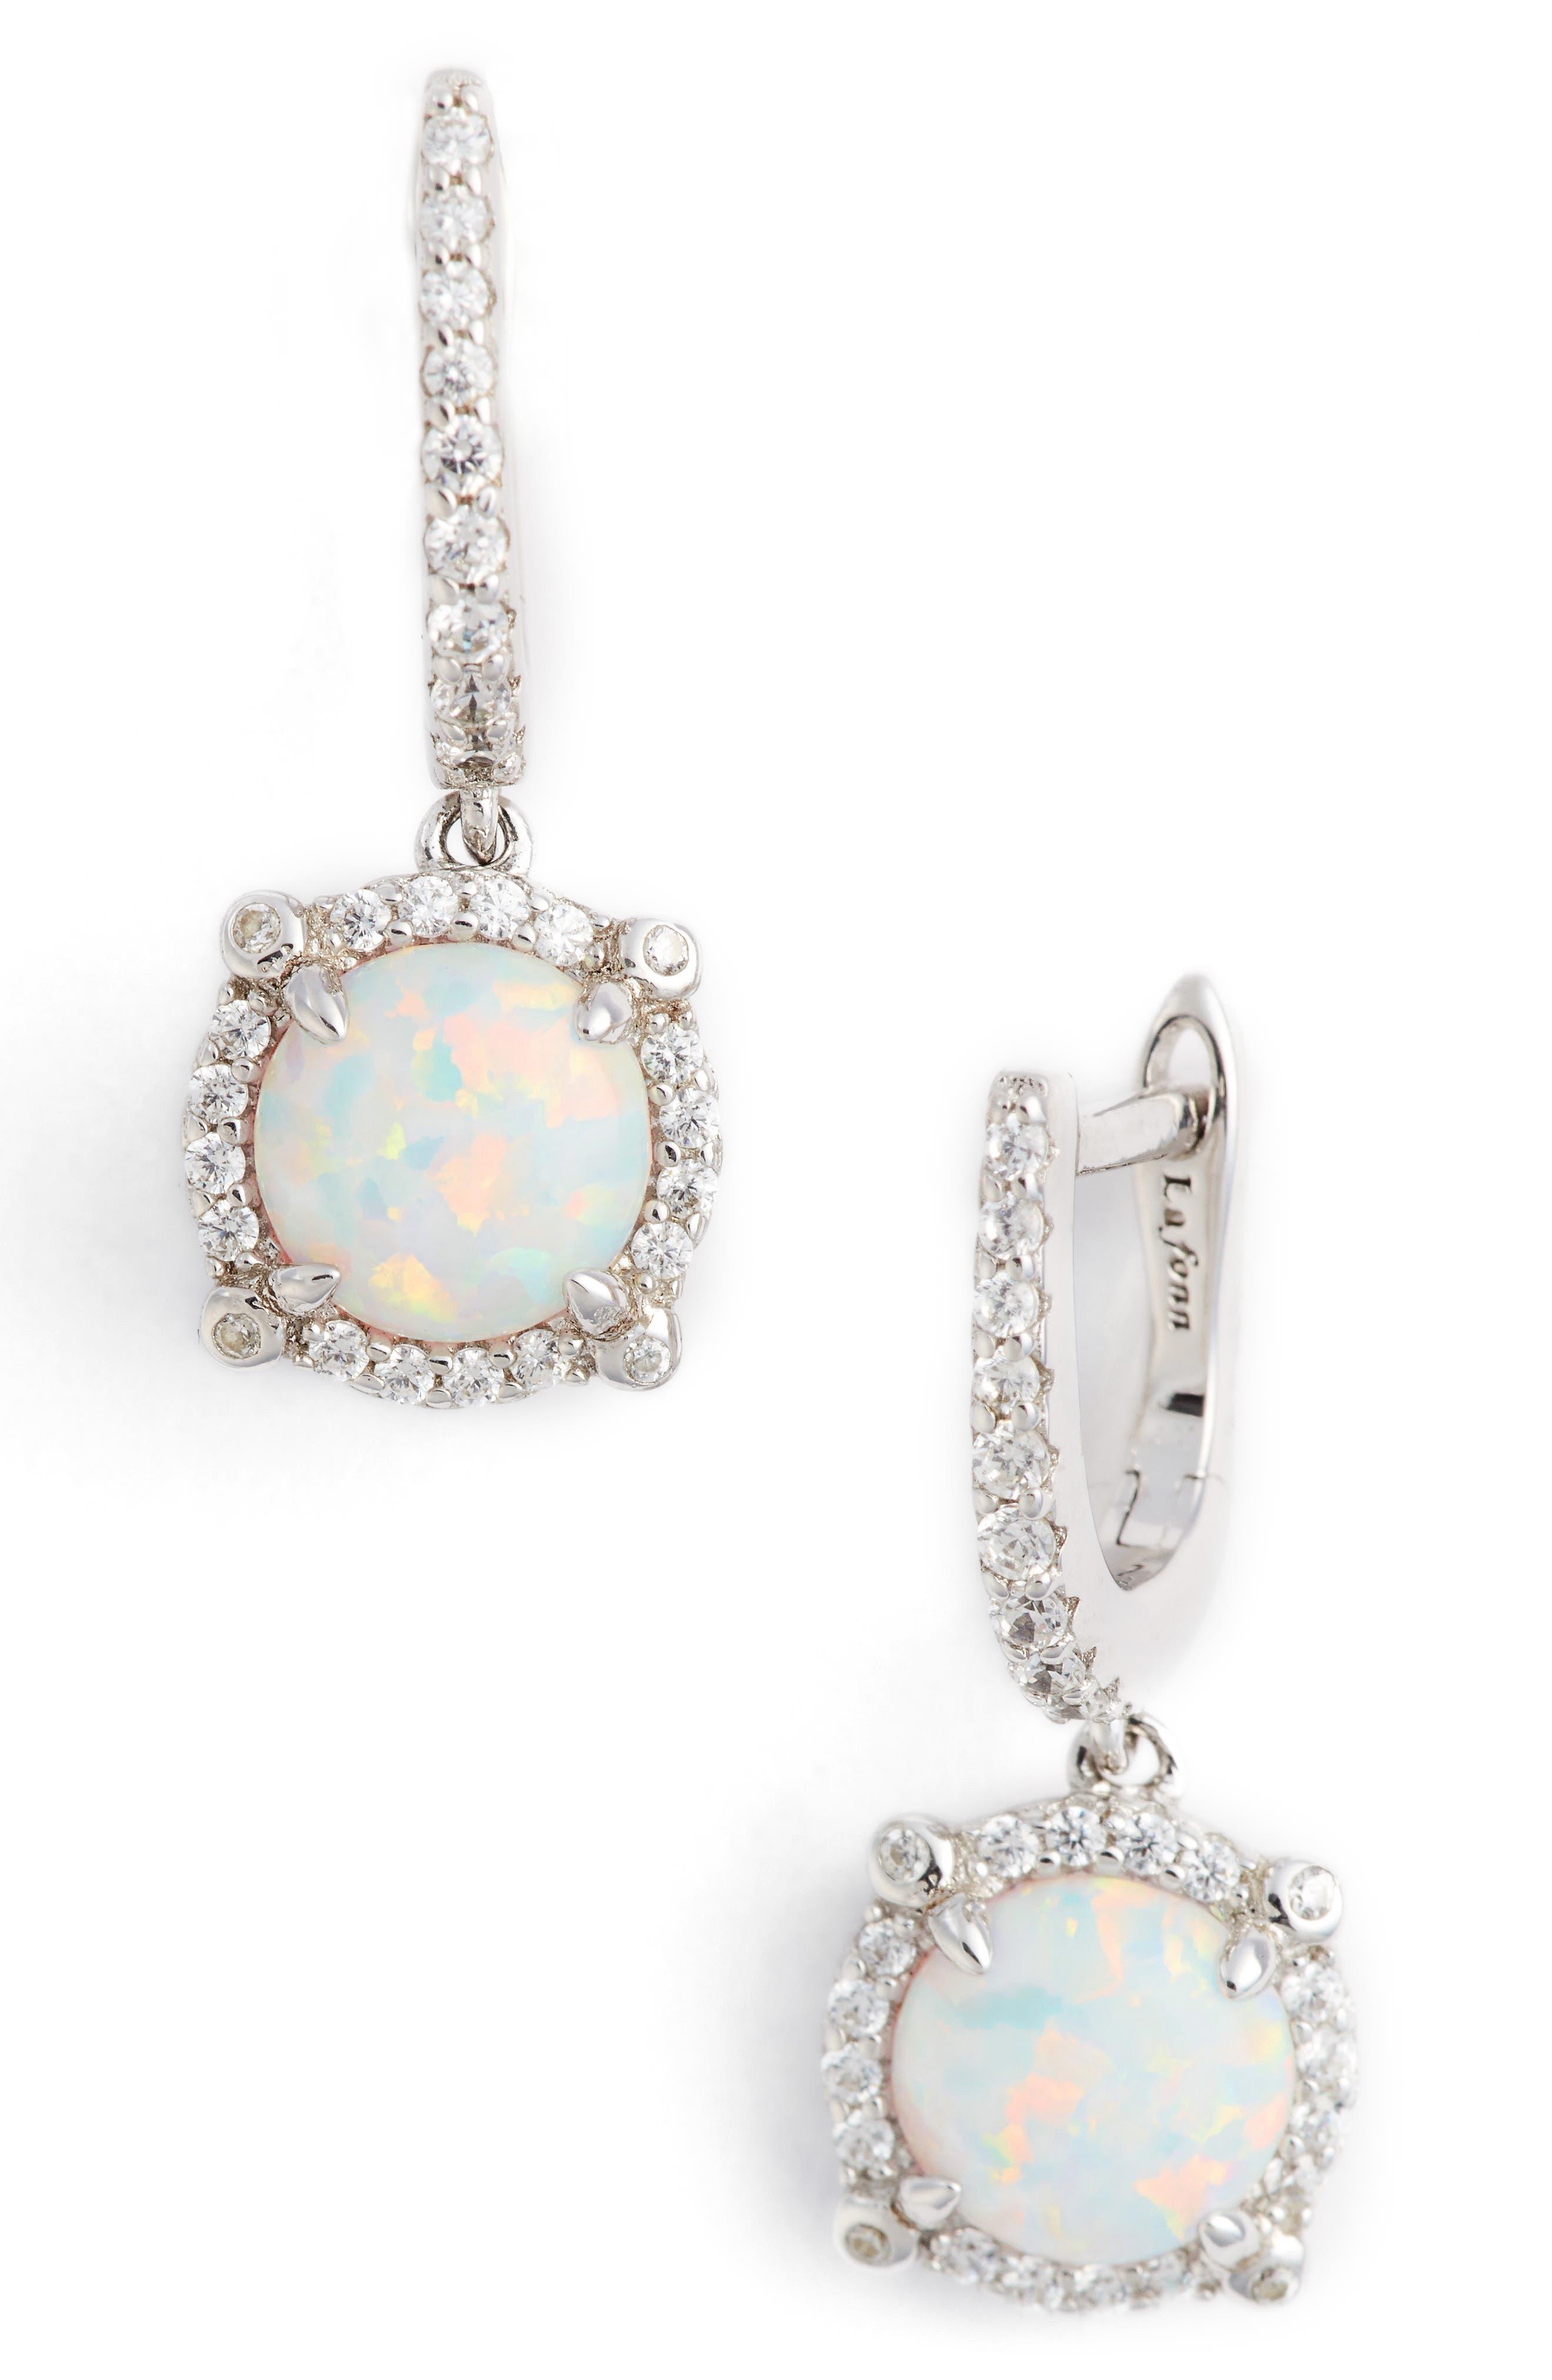 Simulated Diamond Drop Earrings,                         Main,                         color, SILVER/ OPAL/ CLEAR